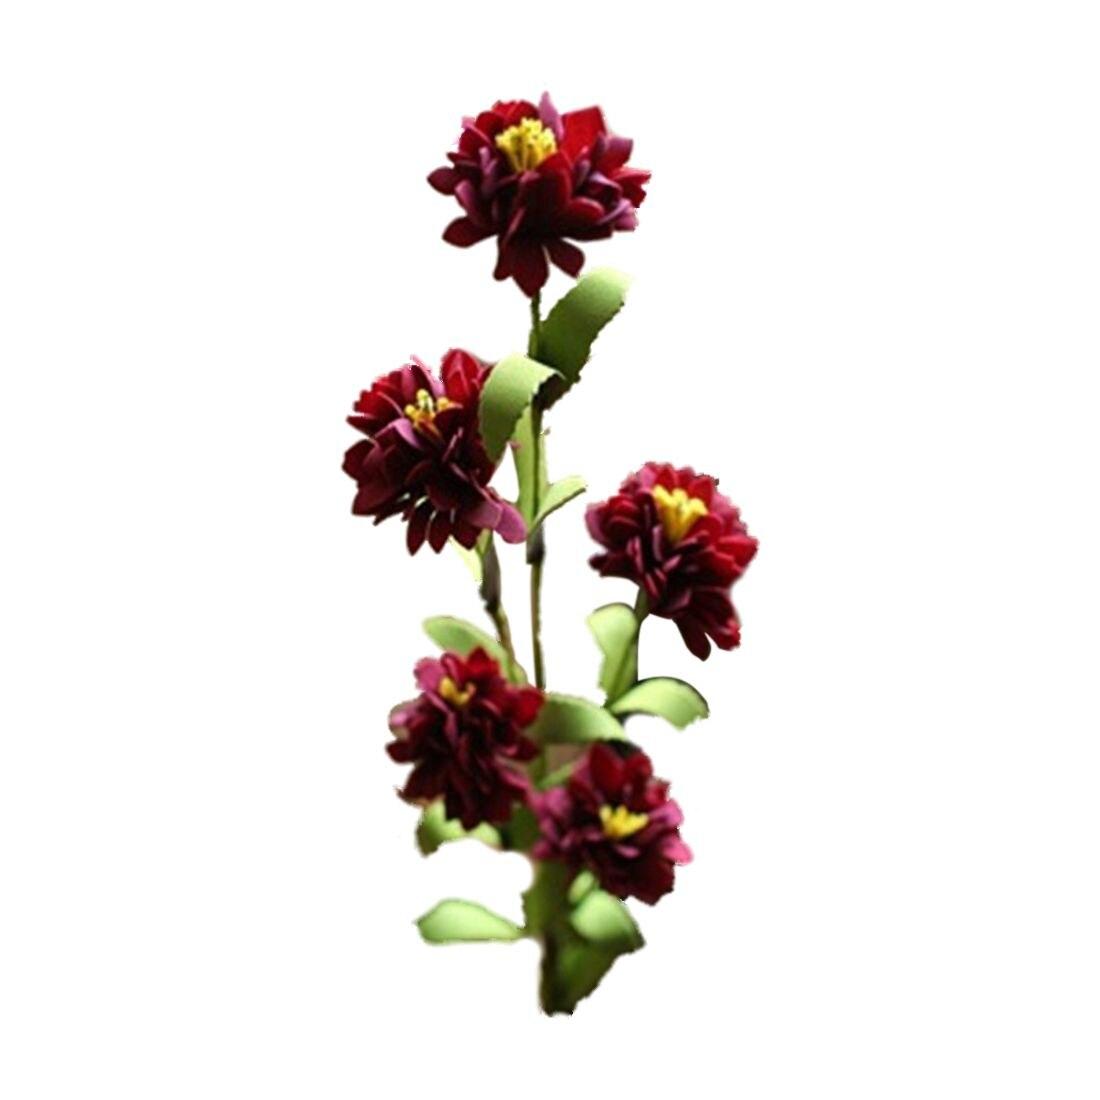 Compare prices on carnation flower arrangement online shopping uesh 4 bouquets 5 heads carnation silk flower artificial flower for home decor diy flower dhlflorist Gallery